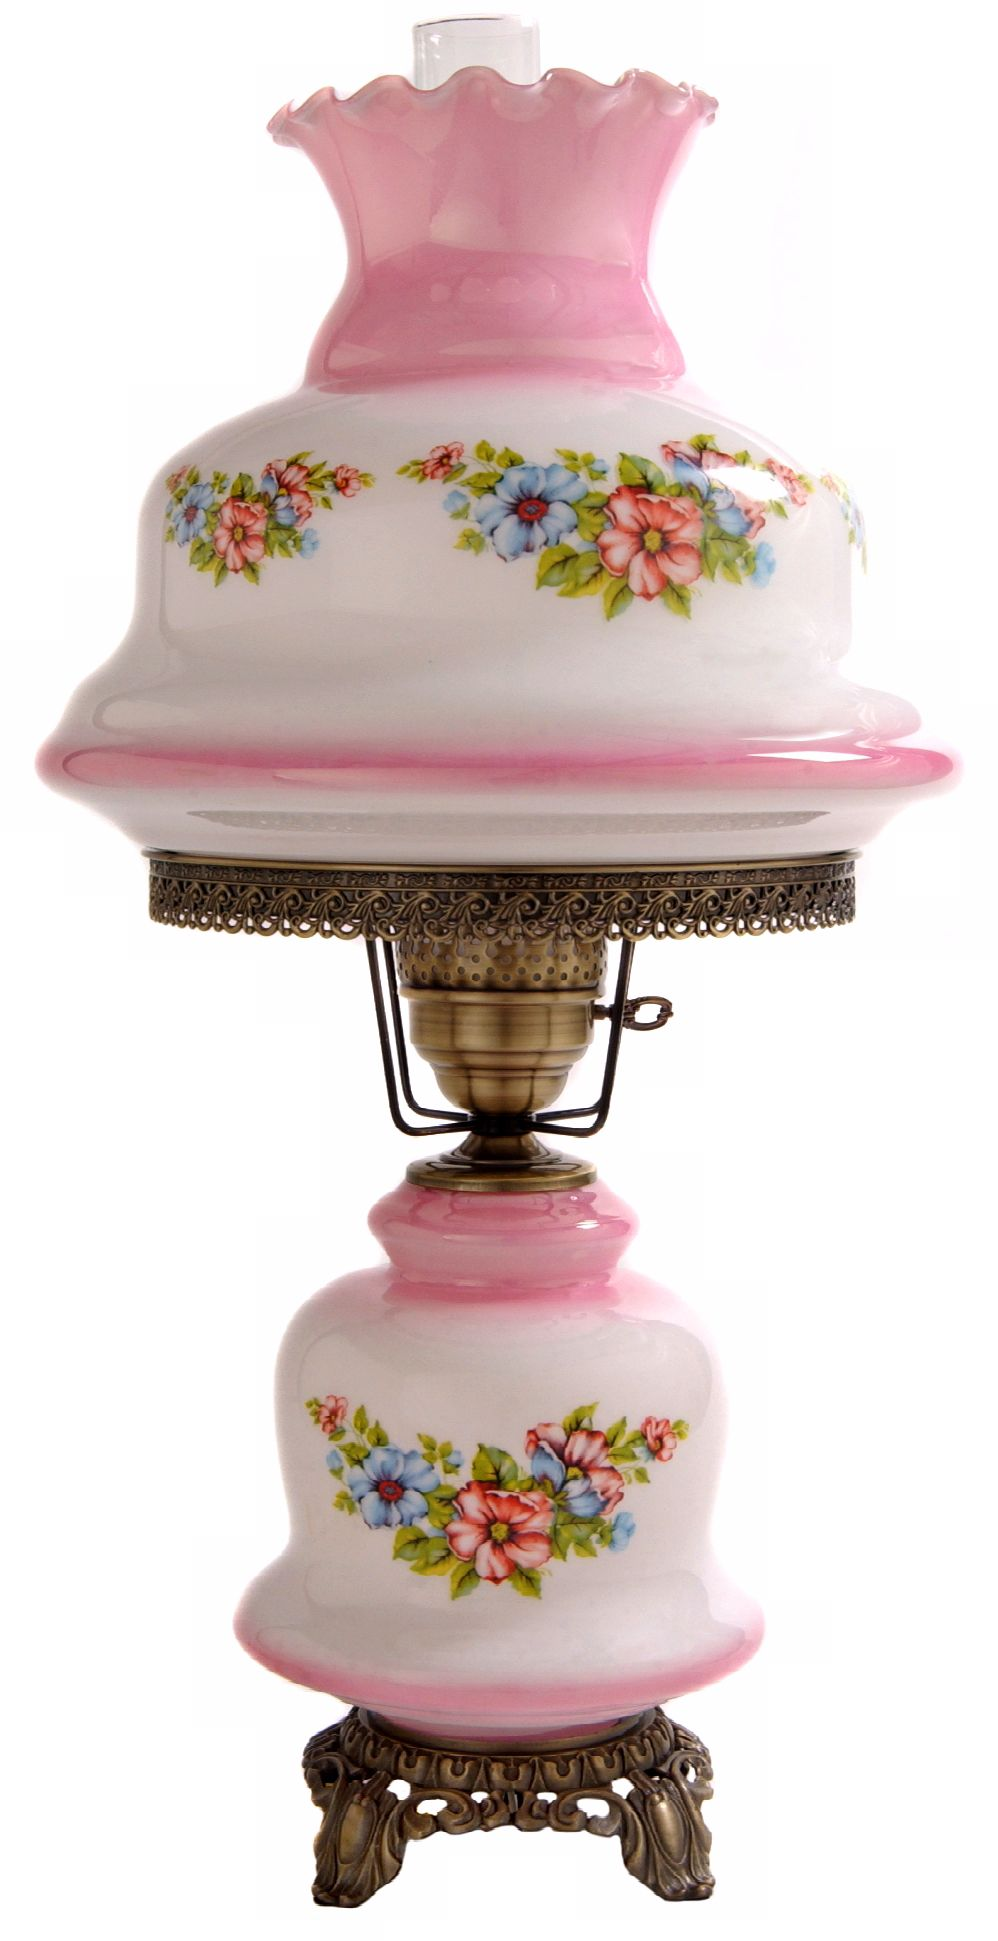 Large Pink Tint Floral Night Light Hurricane Table Lamp